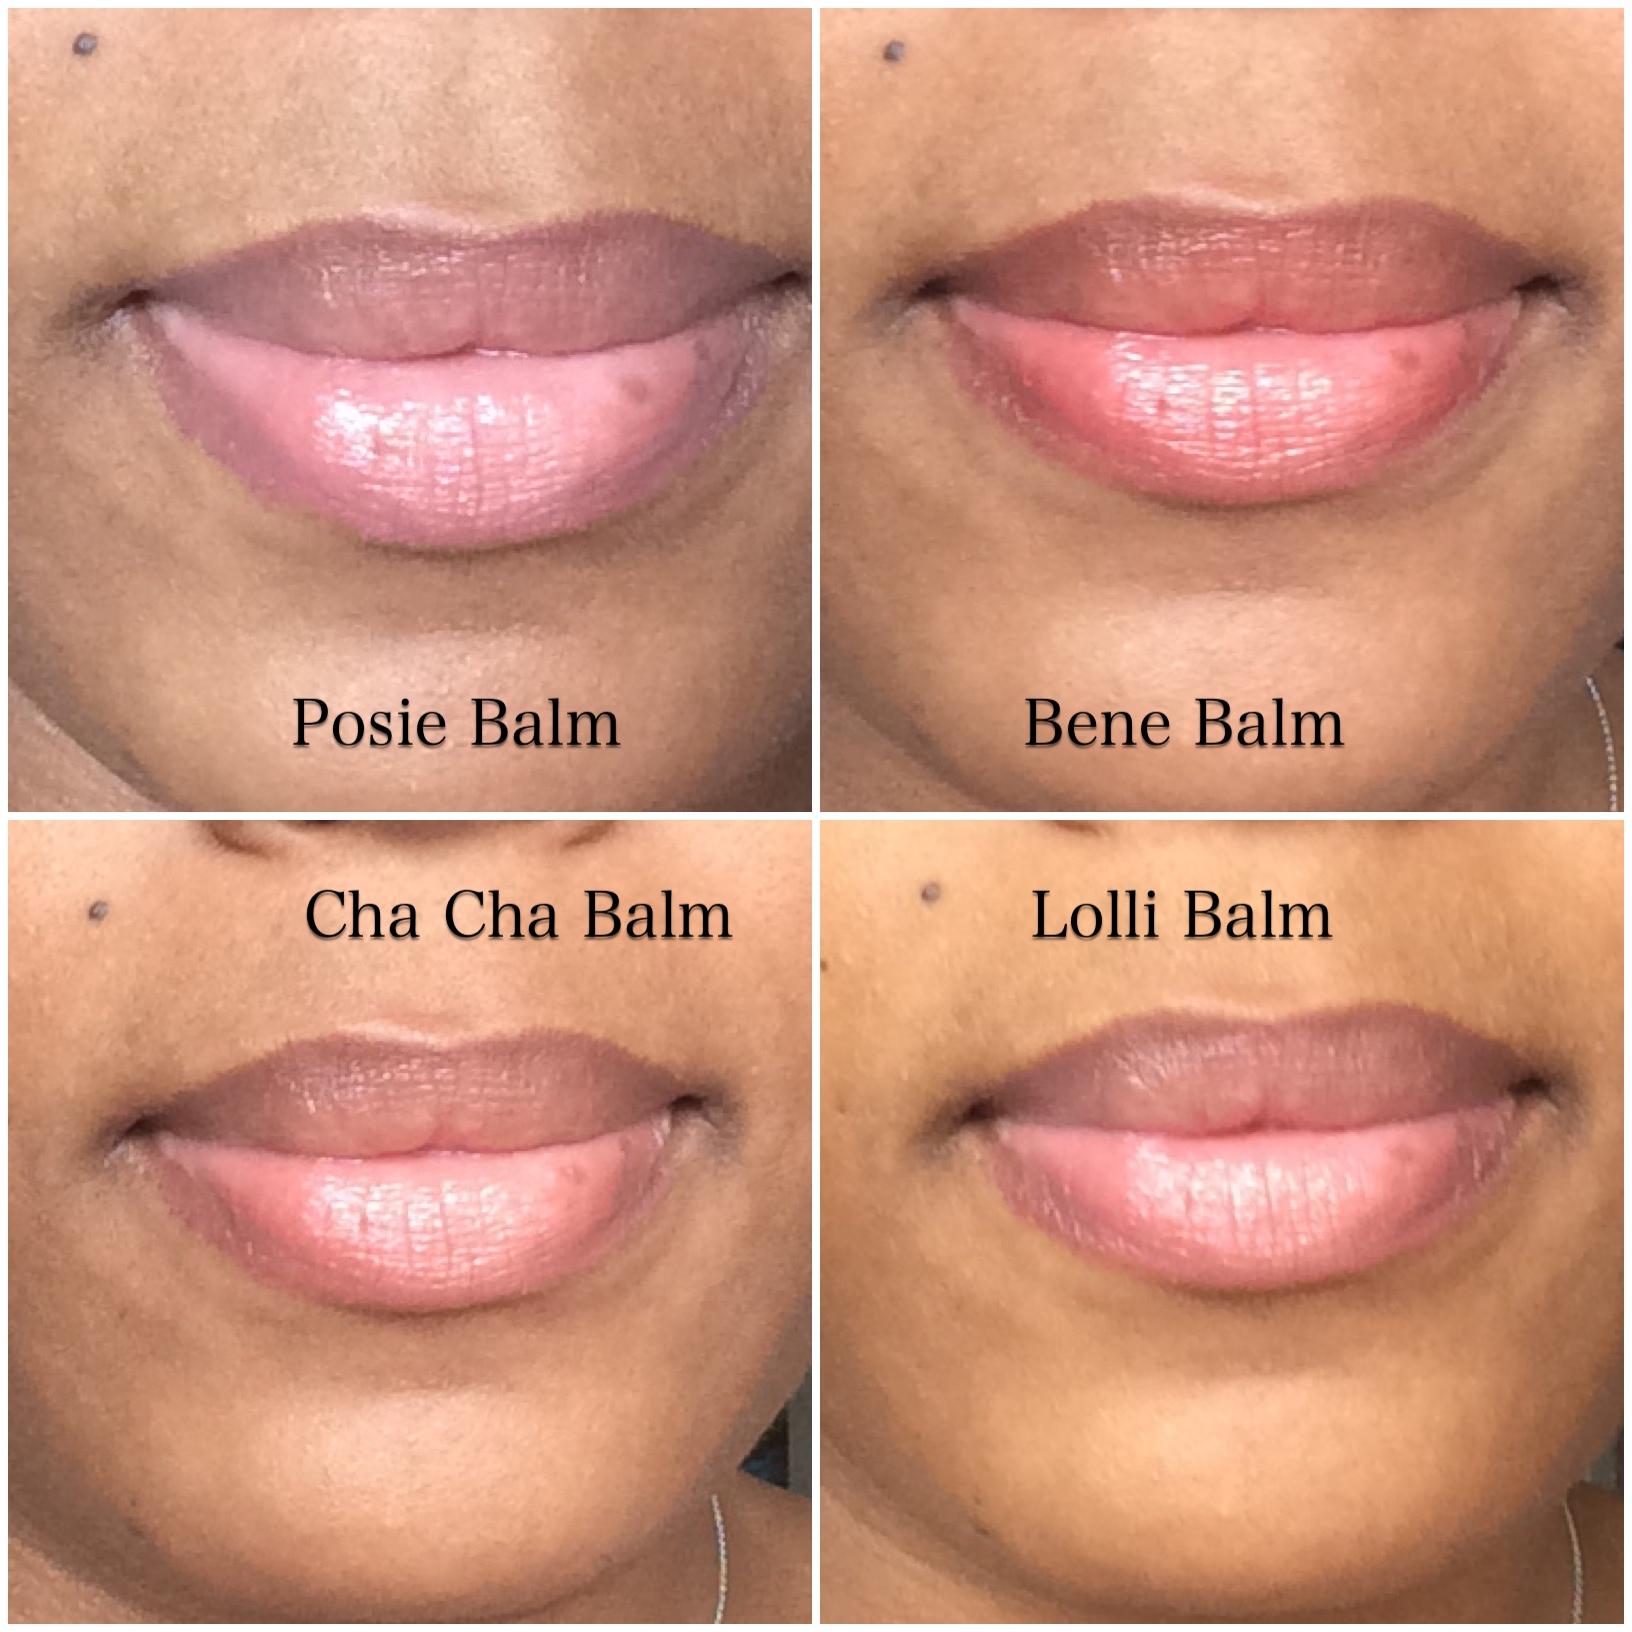 Benefit Hydrating Lip Balms Lipsticks